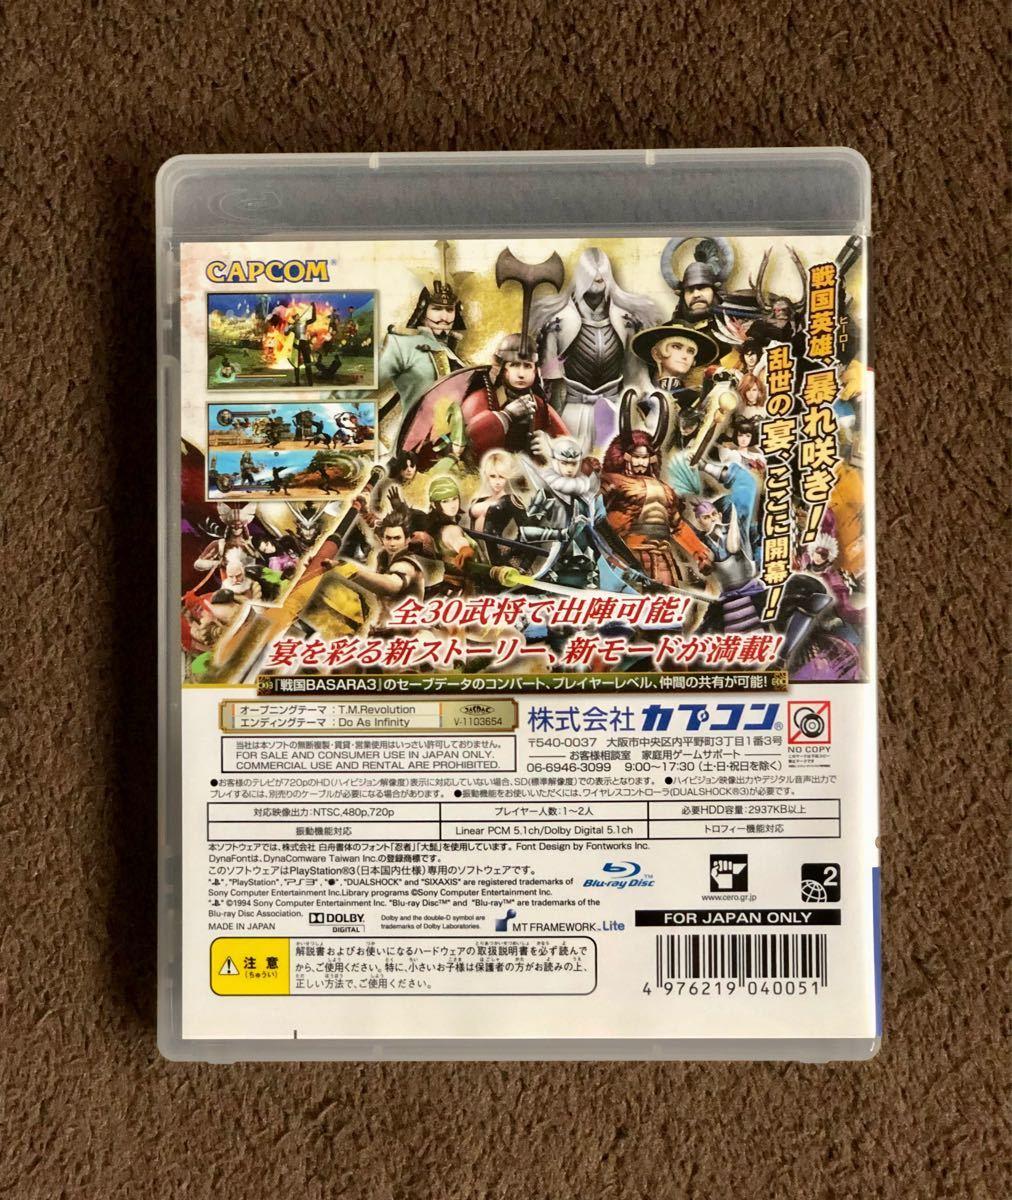 PS3 戦国BASARA3 UTAGE 戦国バサラ3 宴 プレイステーション3 ソフト【箱説有・簡易清掃済・動作確認済】